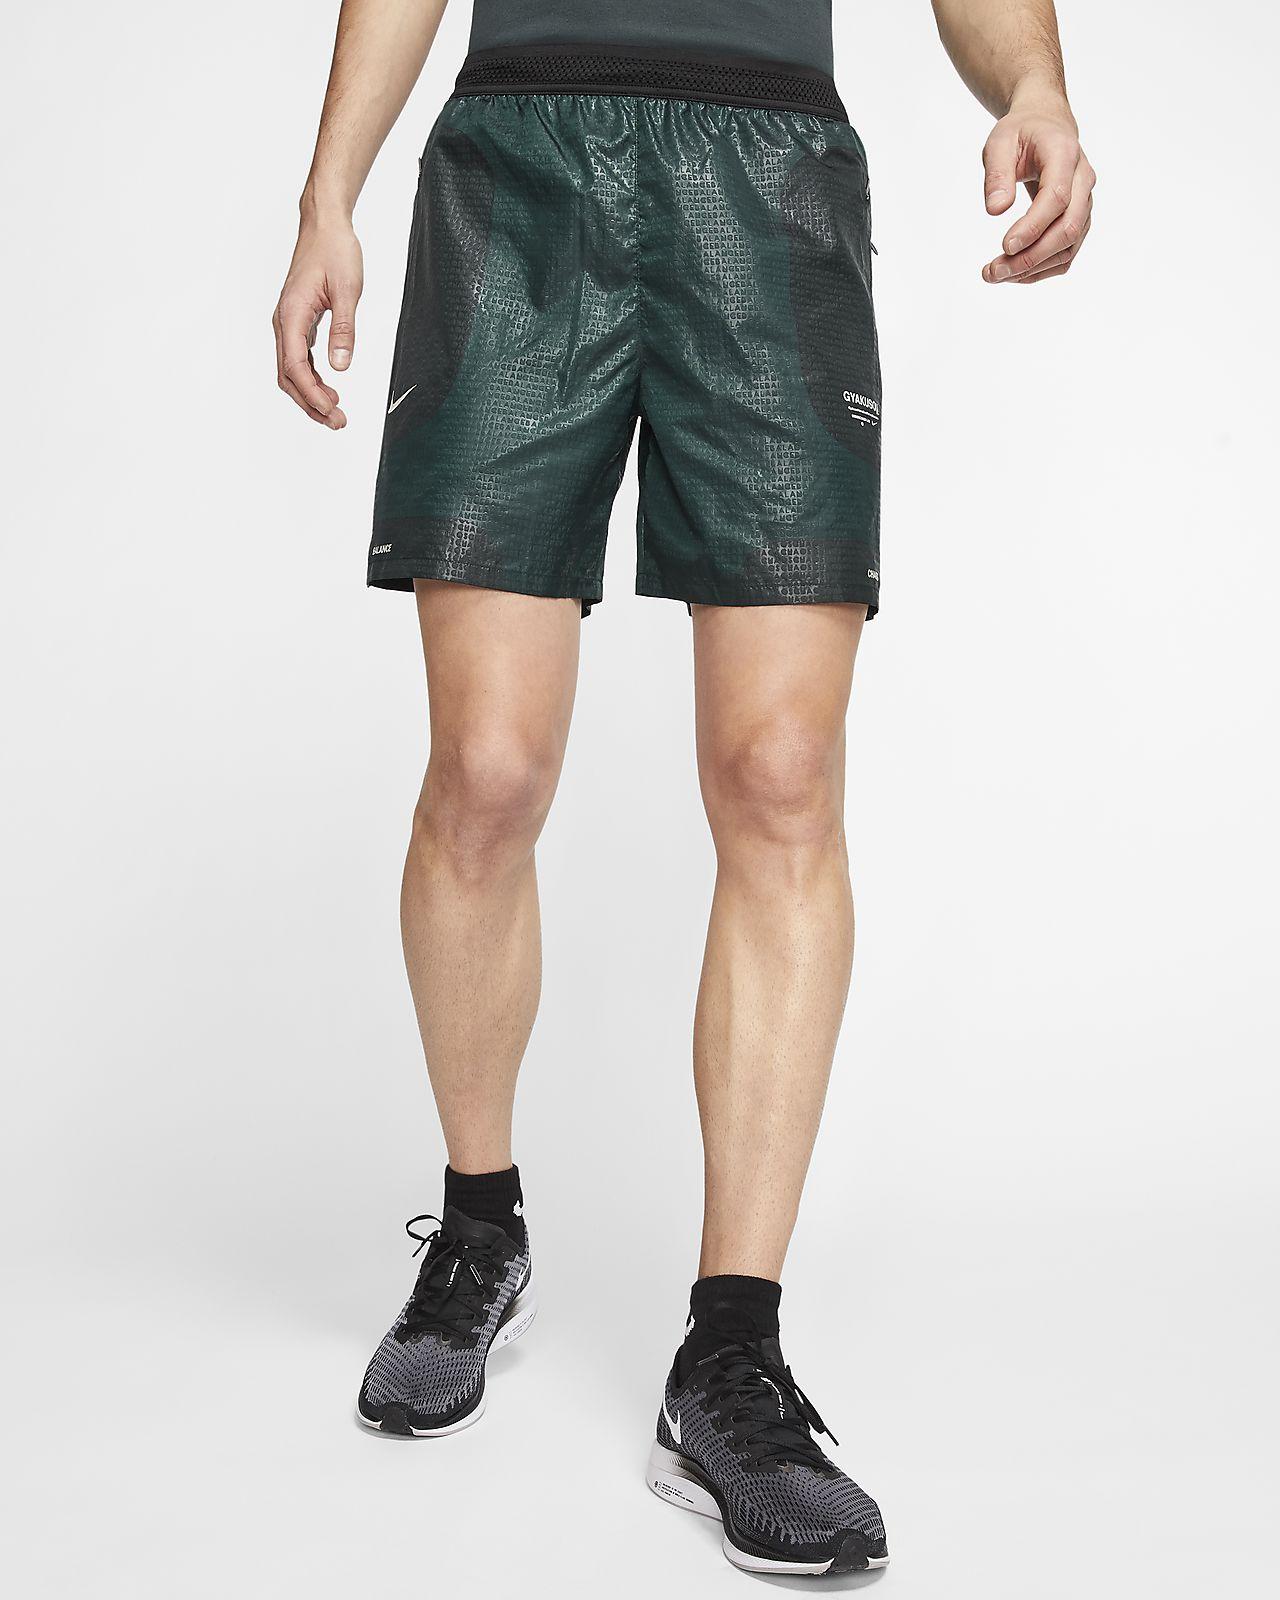 Shorts da running Nike x Gyakusou